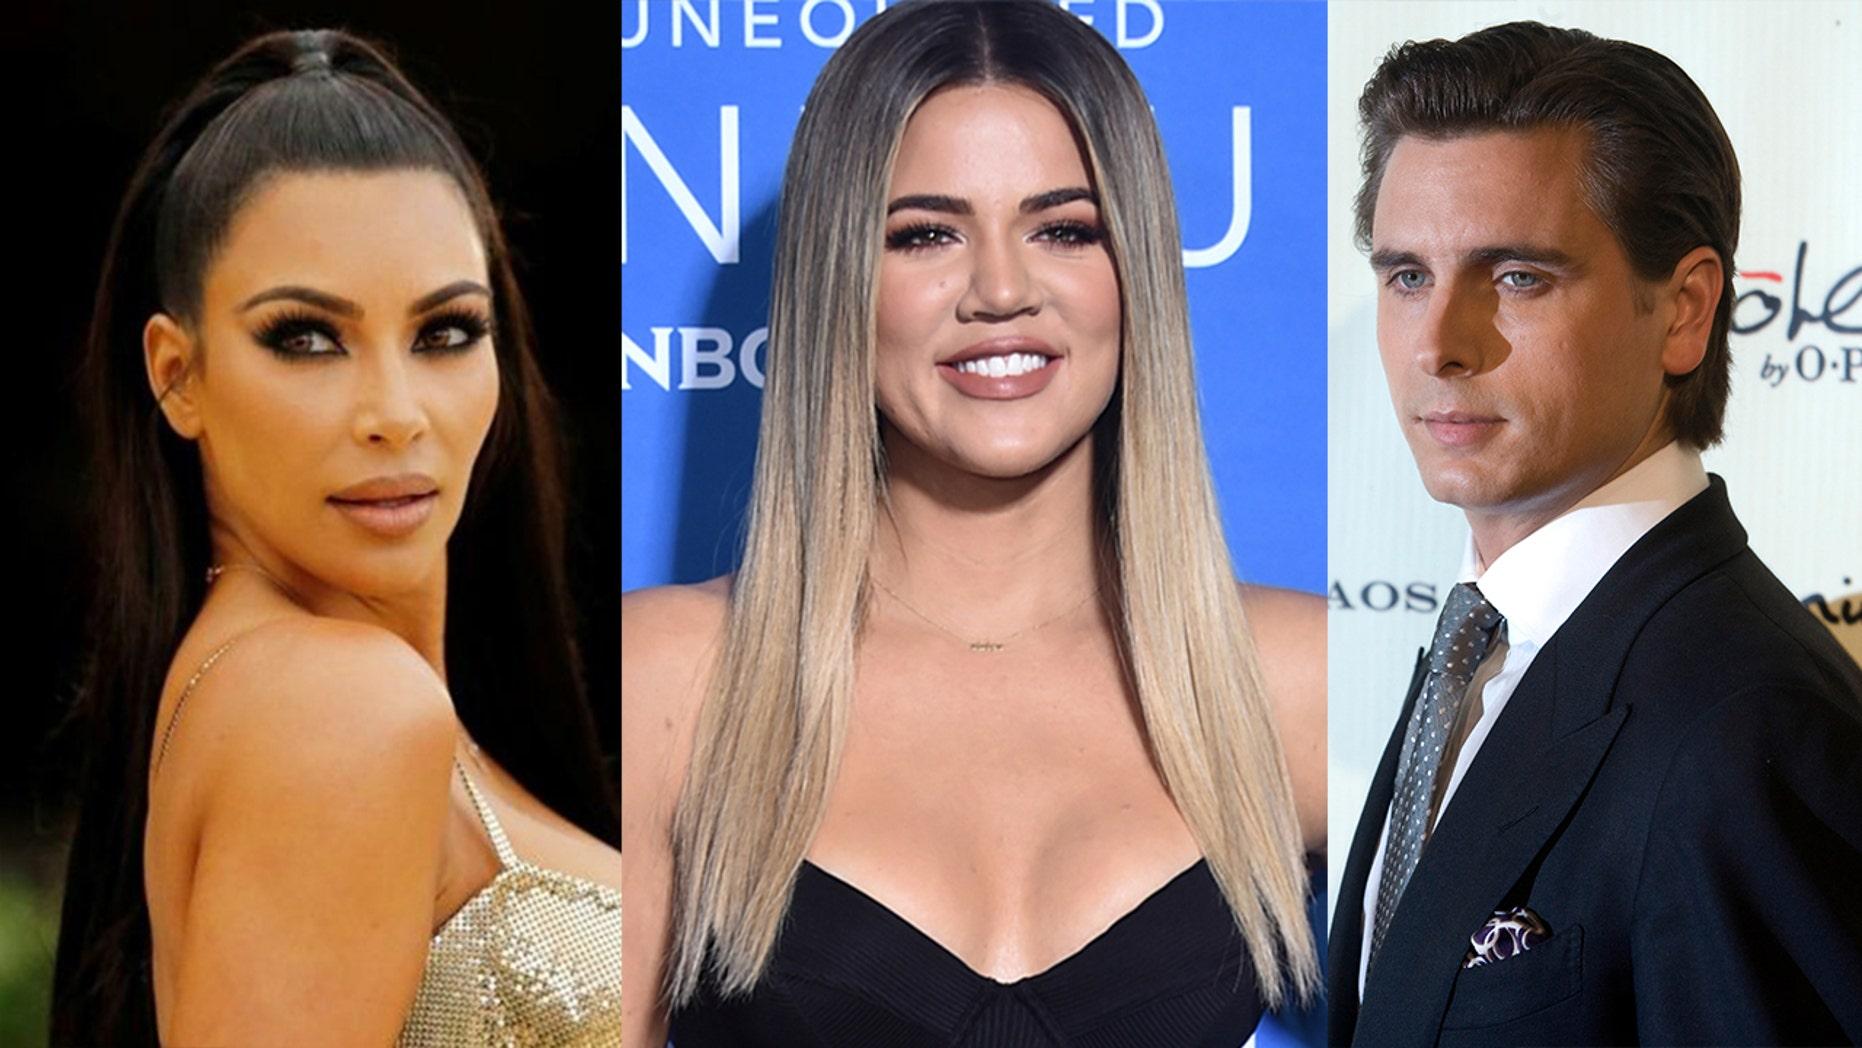 Kim Kardashian, Khloe Kardashian and Scott Disick are in hot water for an unpaid private jet bill.